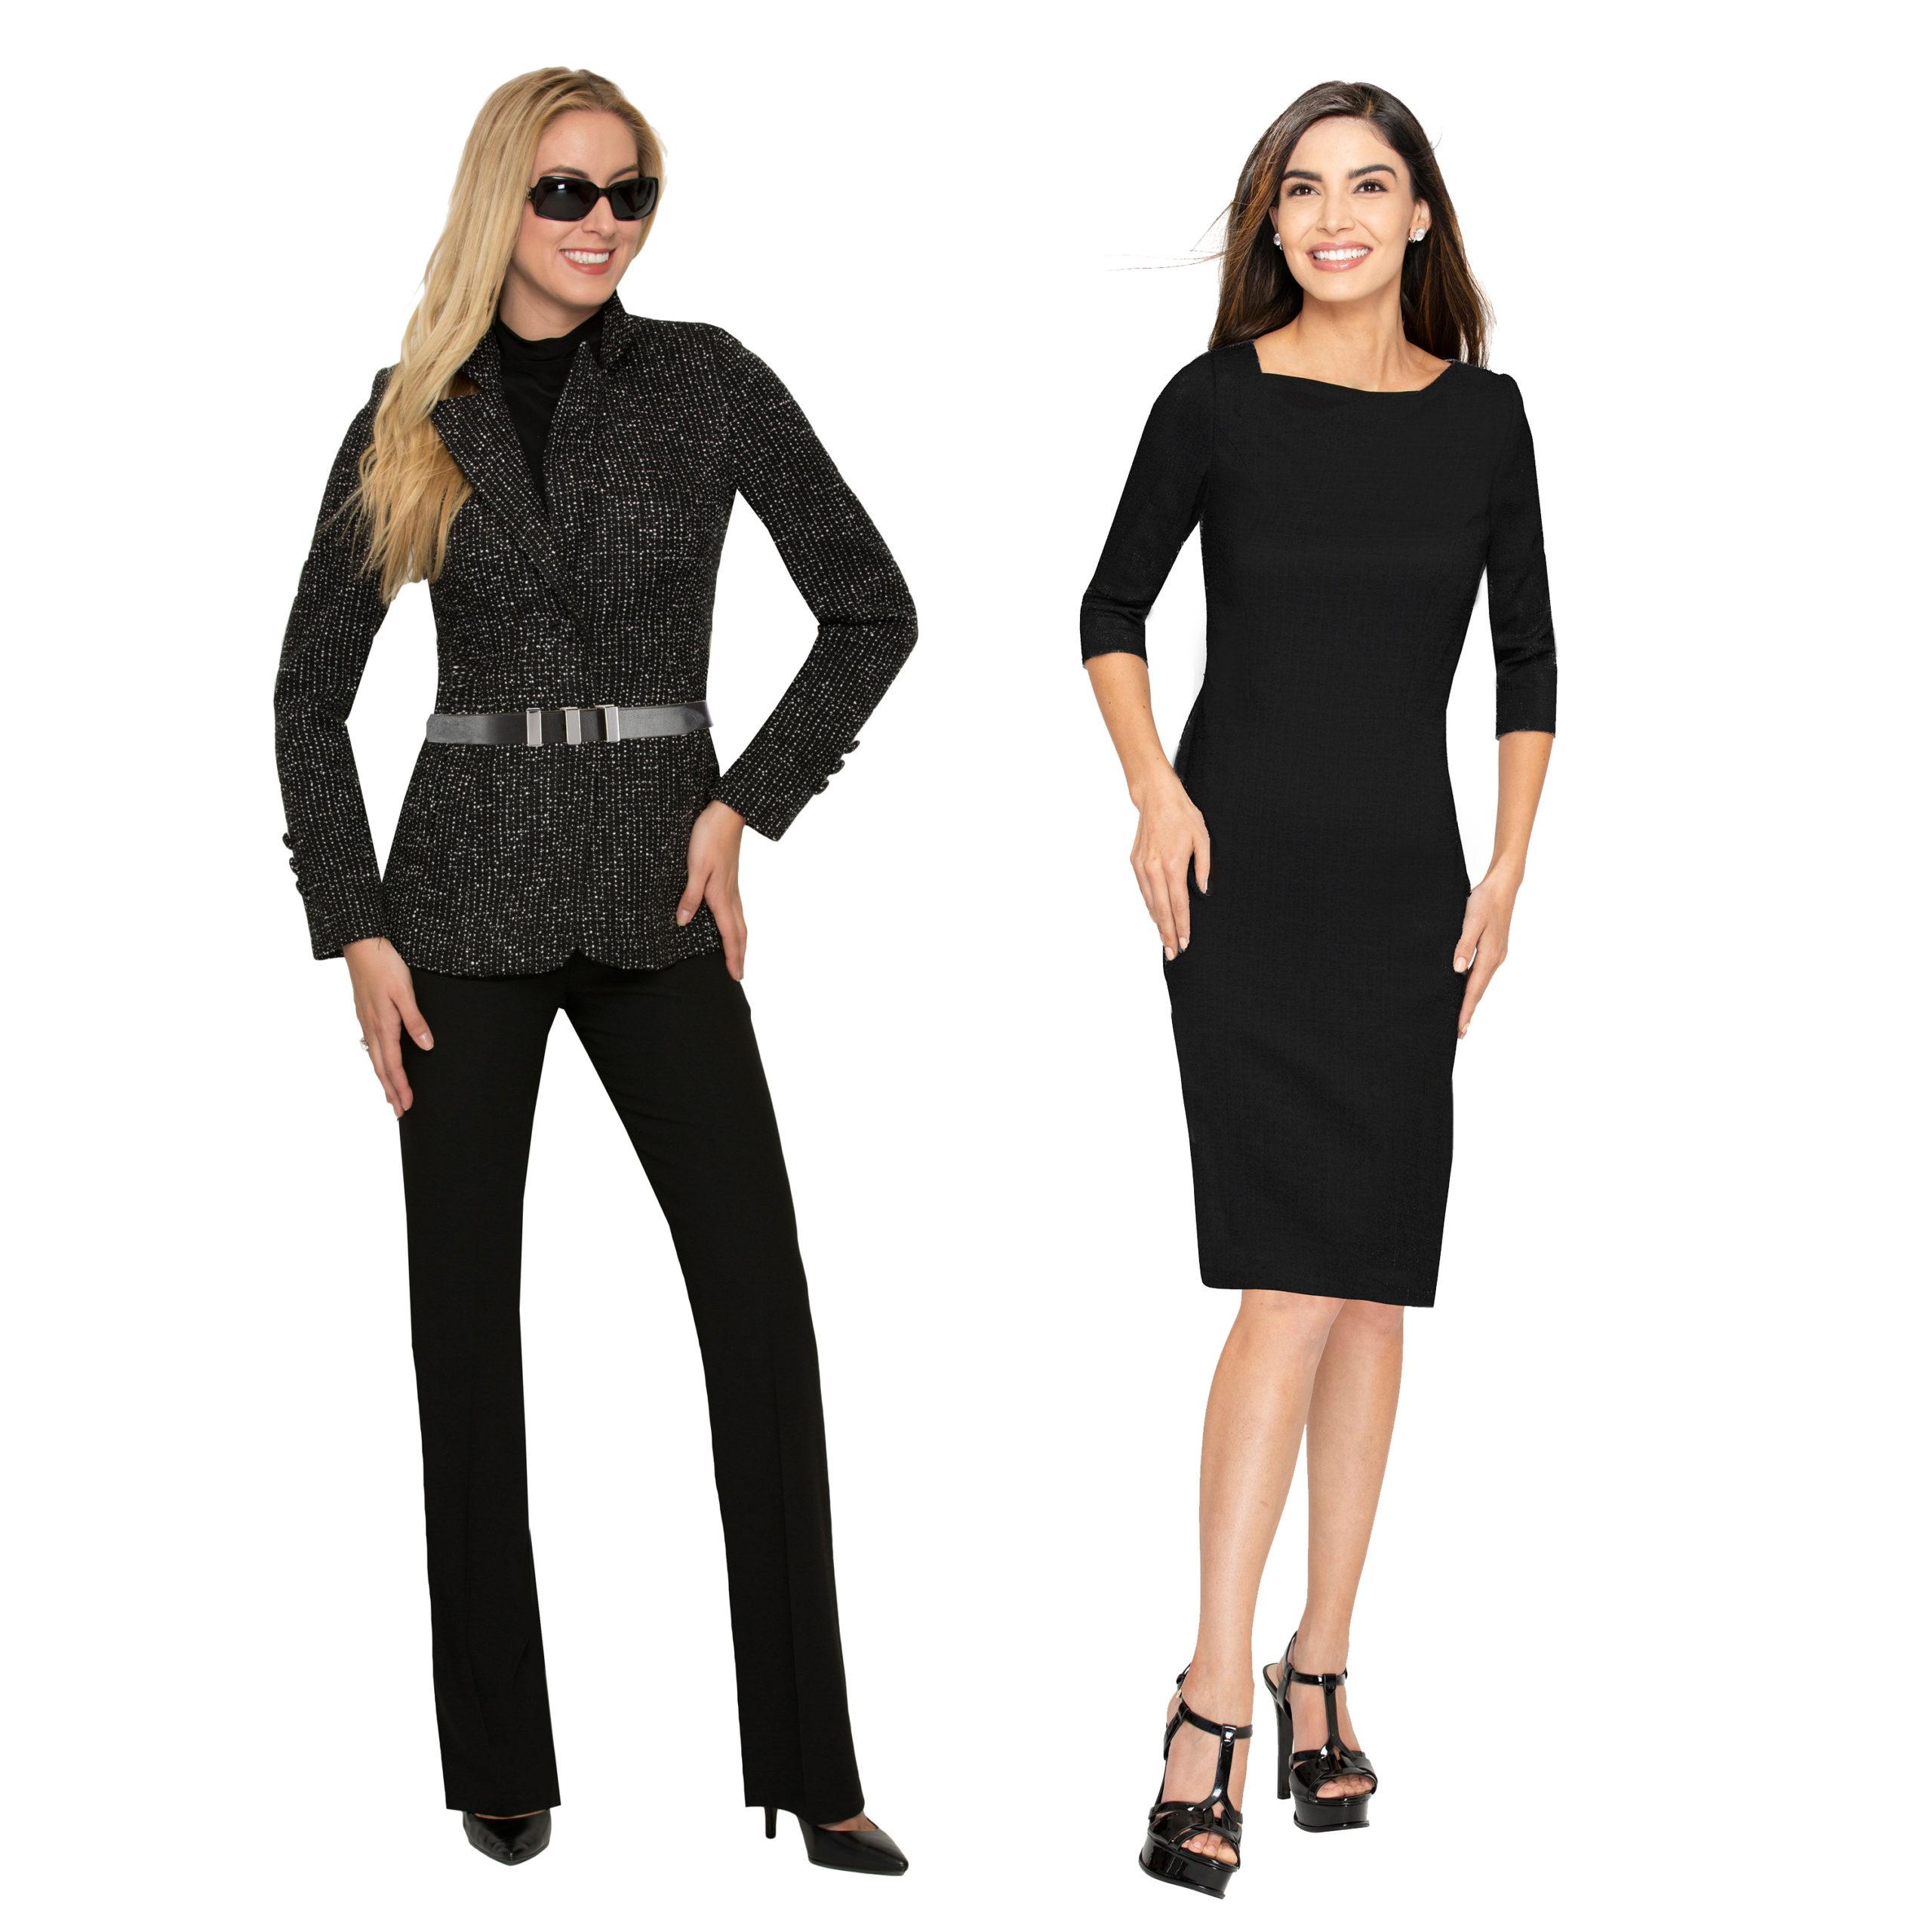 Elegant Wear for Women | Beverly Hills Fashion